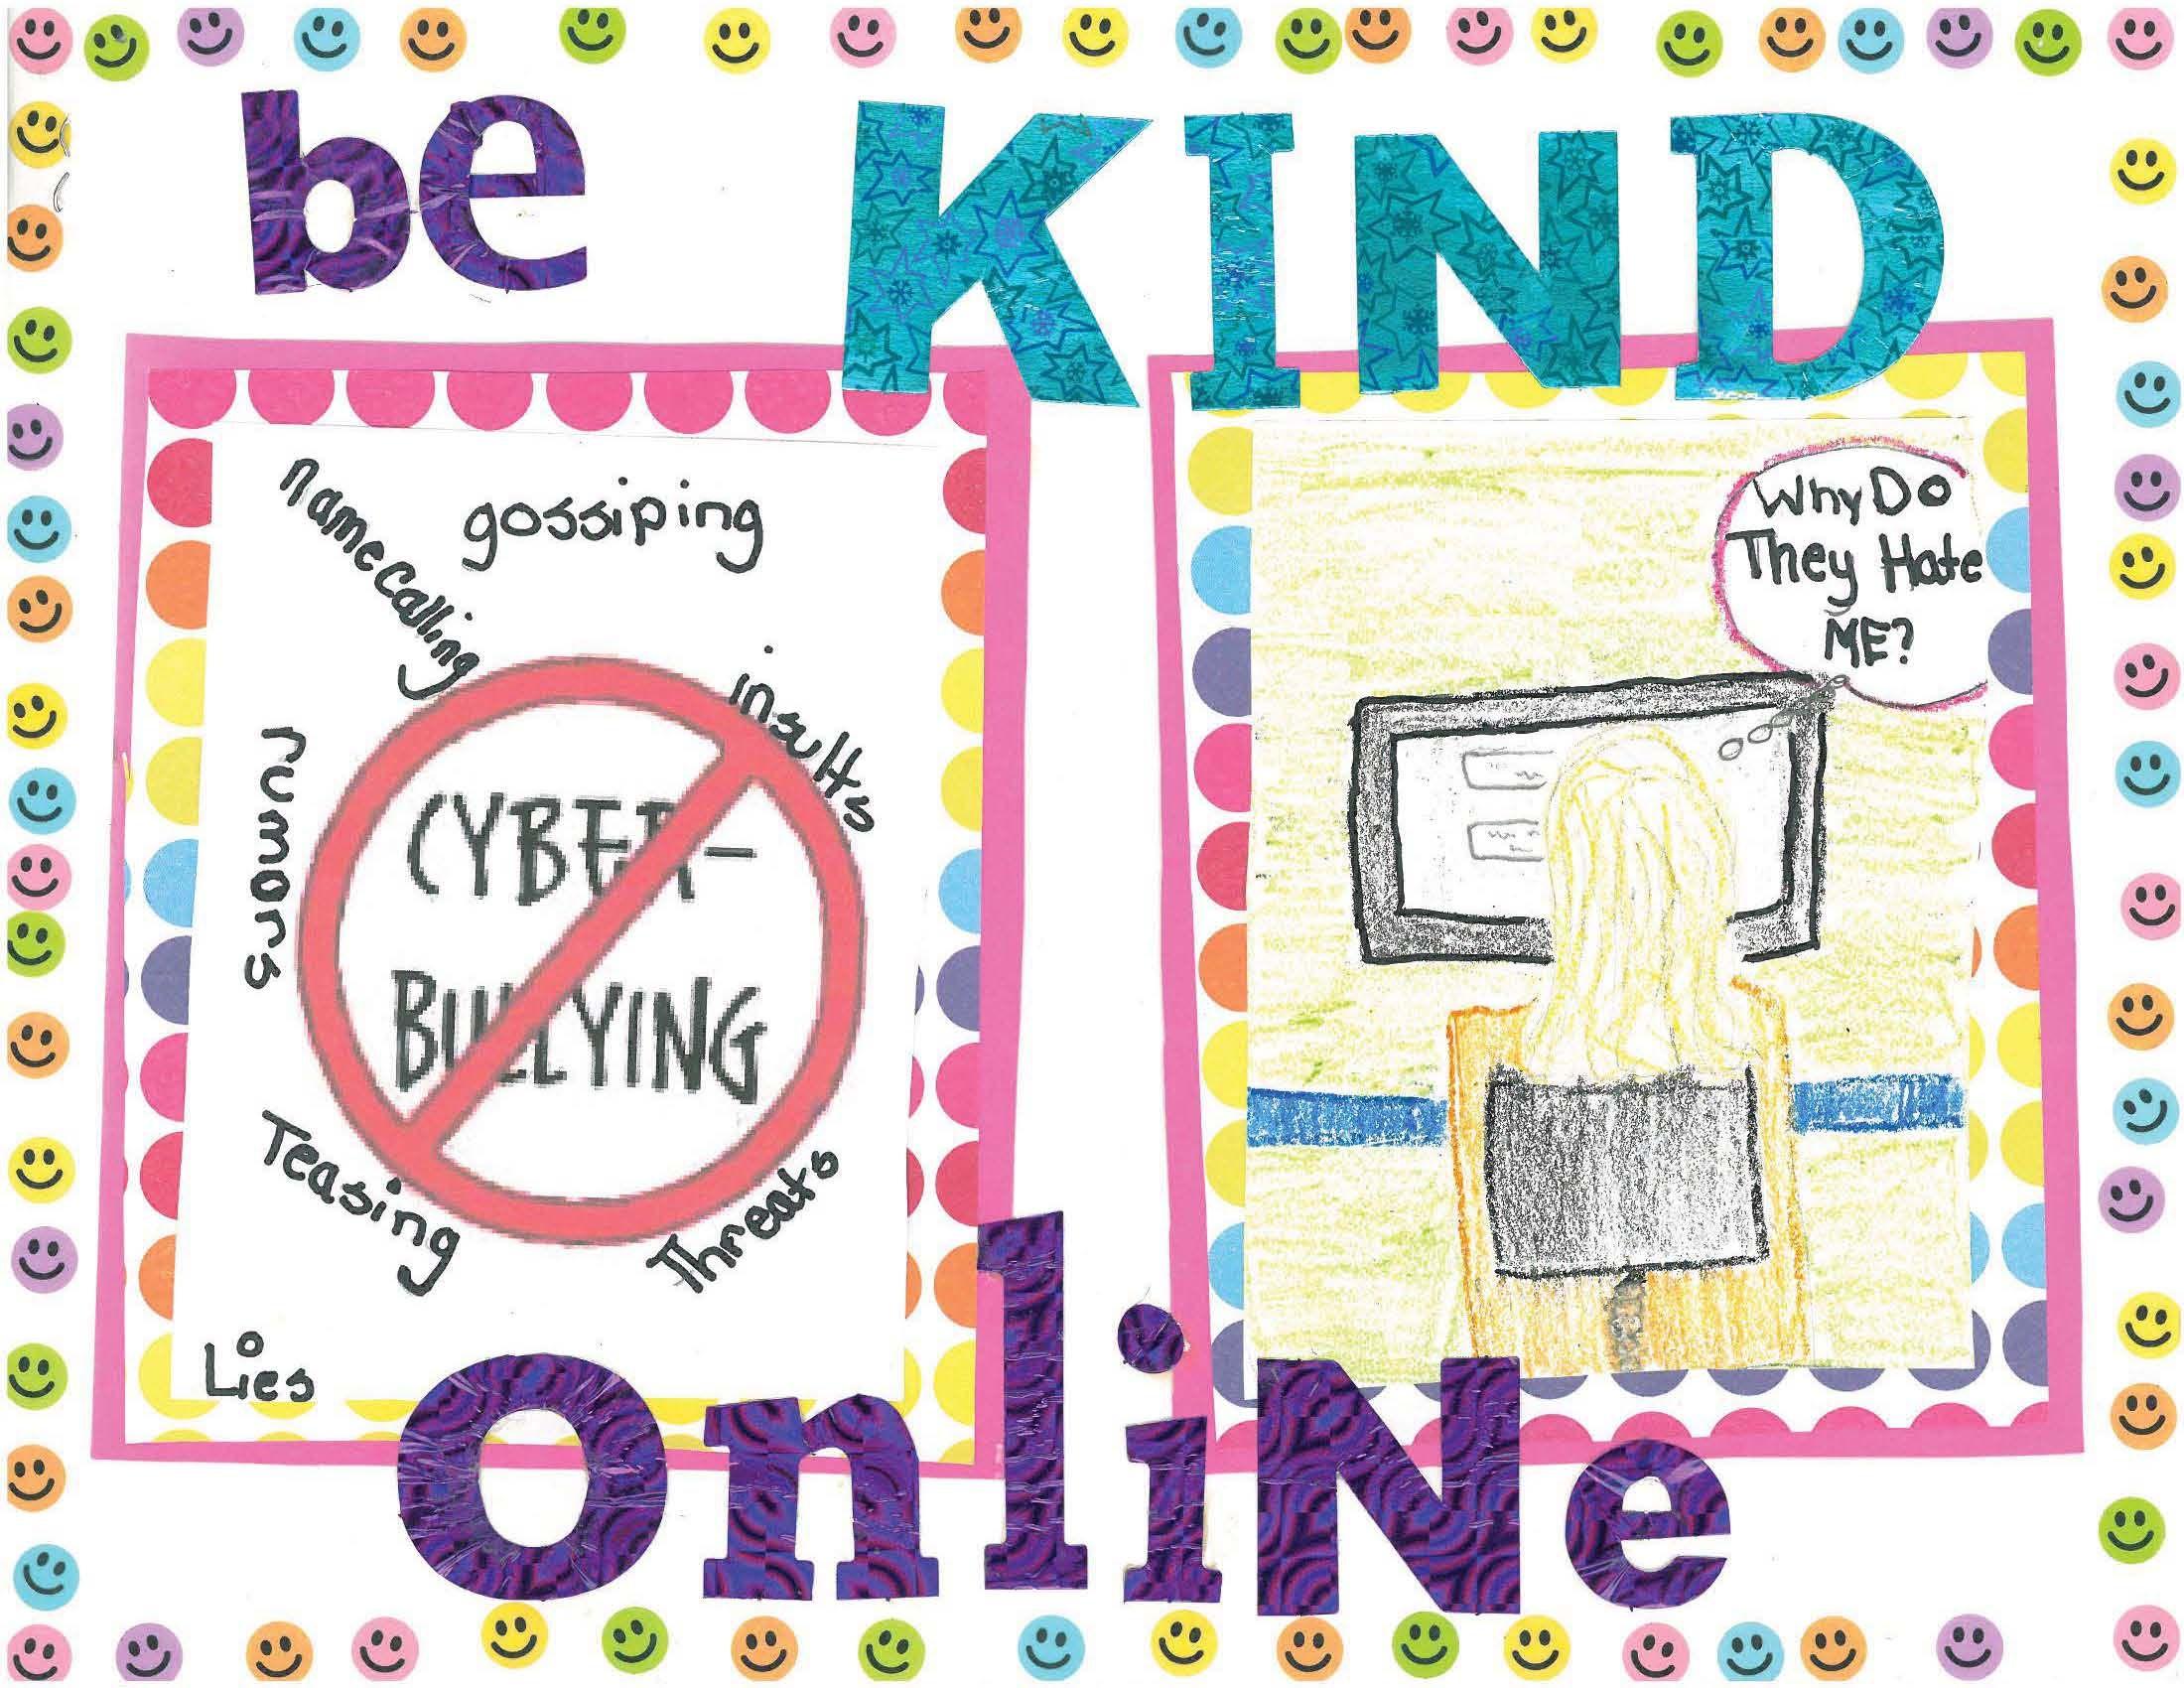 Poster Cyberbullying